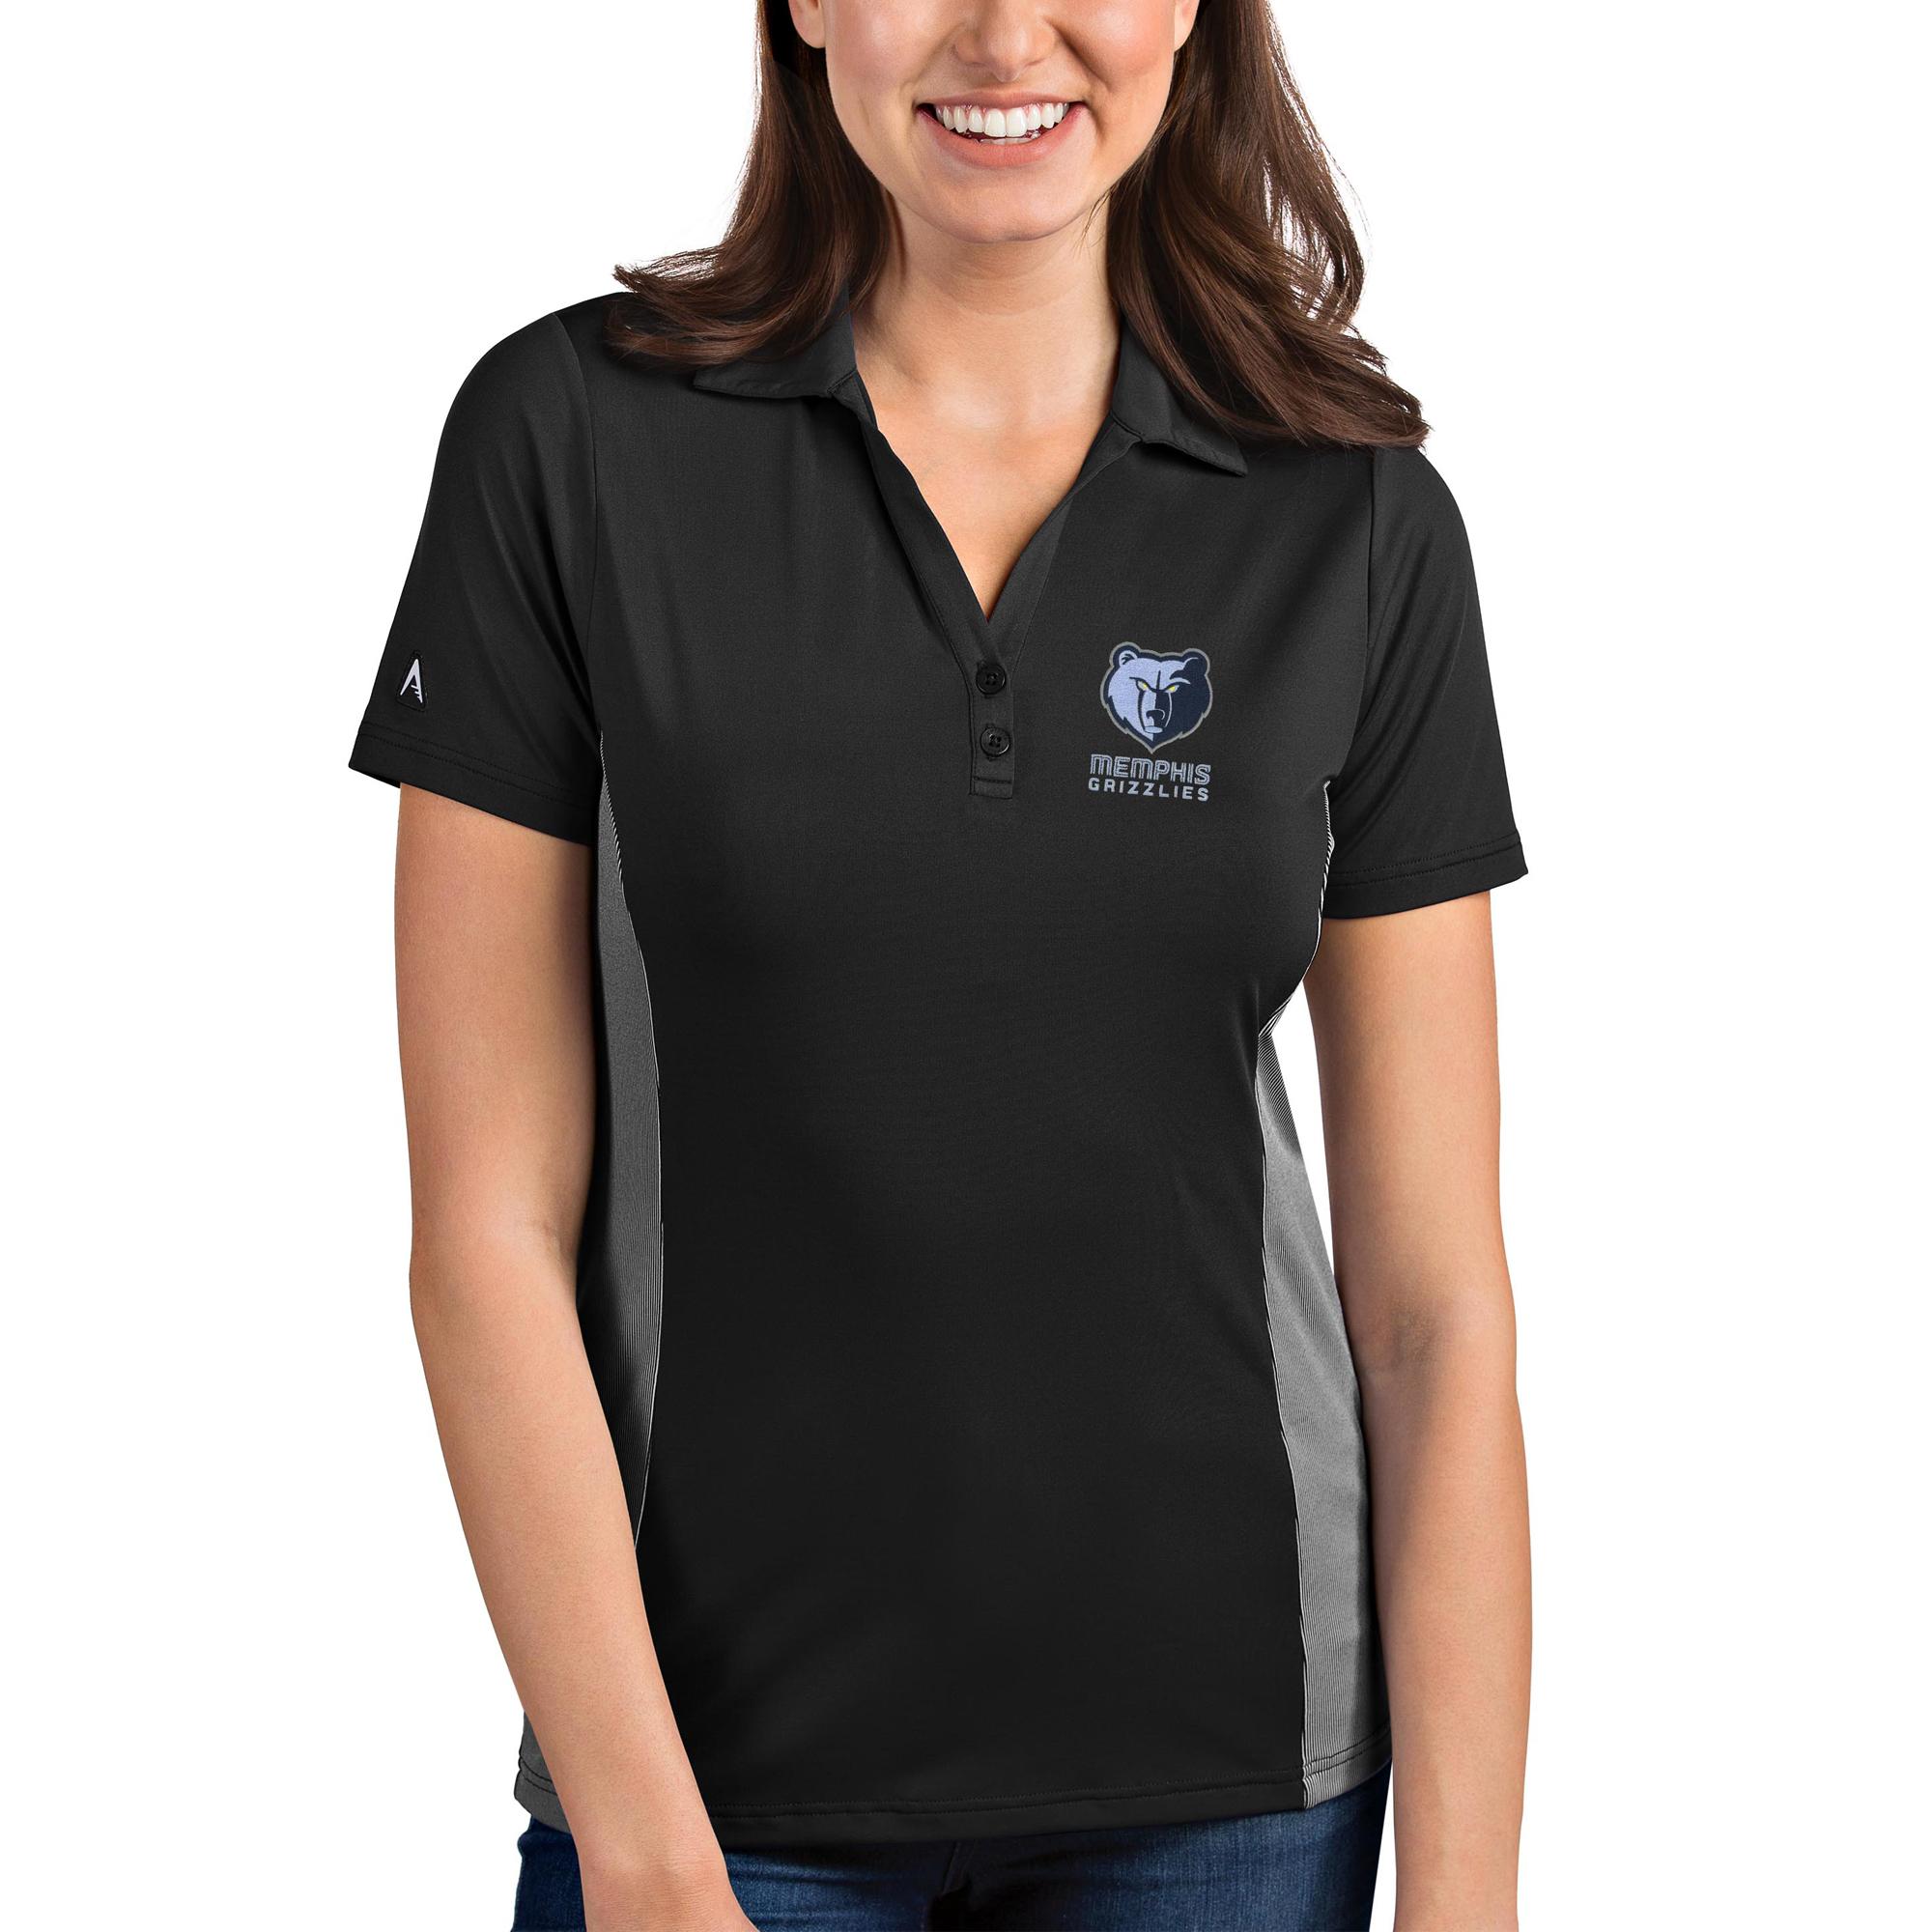 Memphis Grizzlies Antigua Women's Venture Polo - Charcoal/White